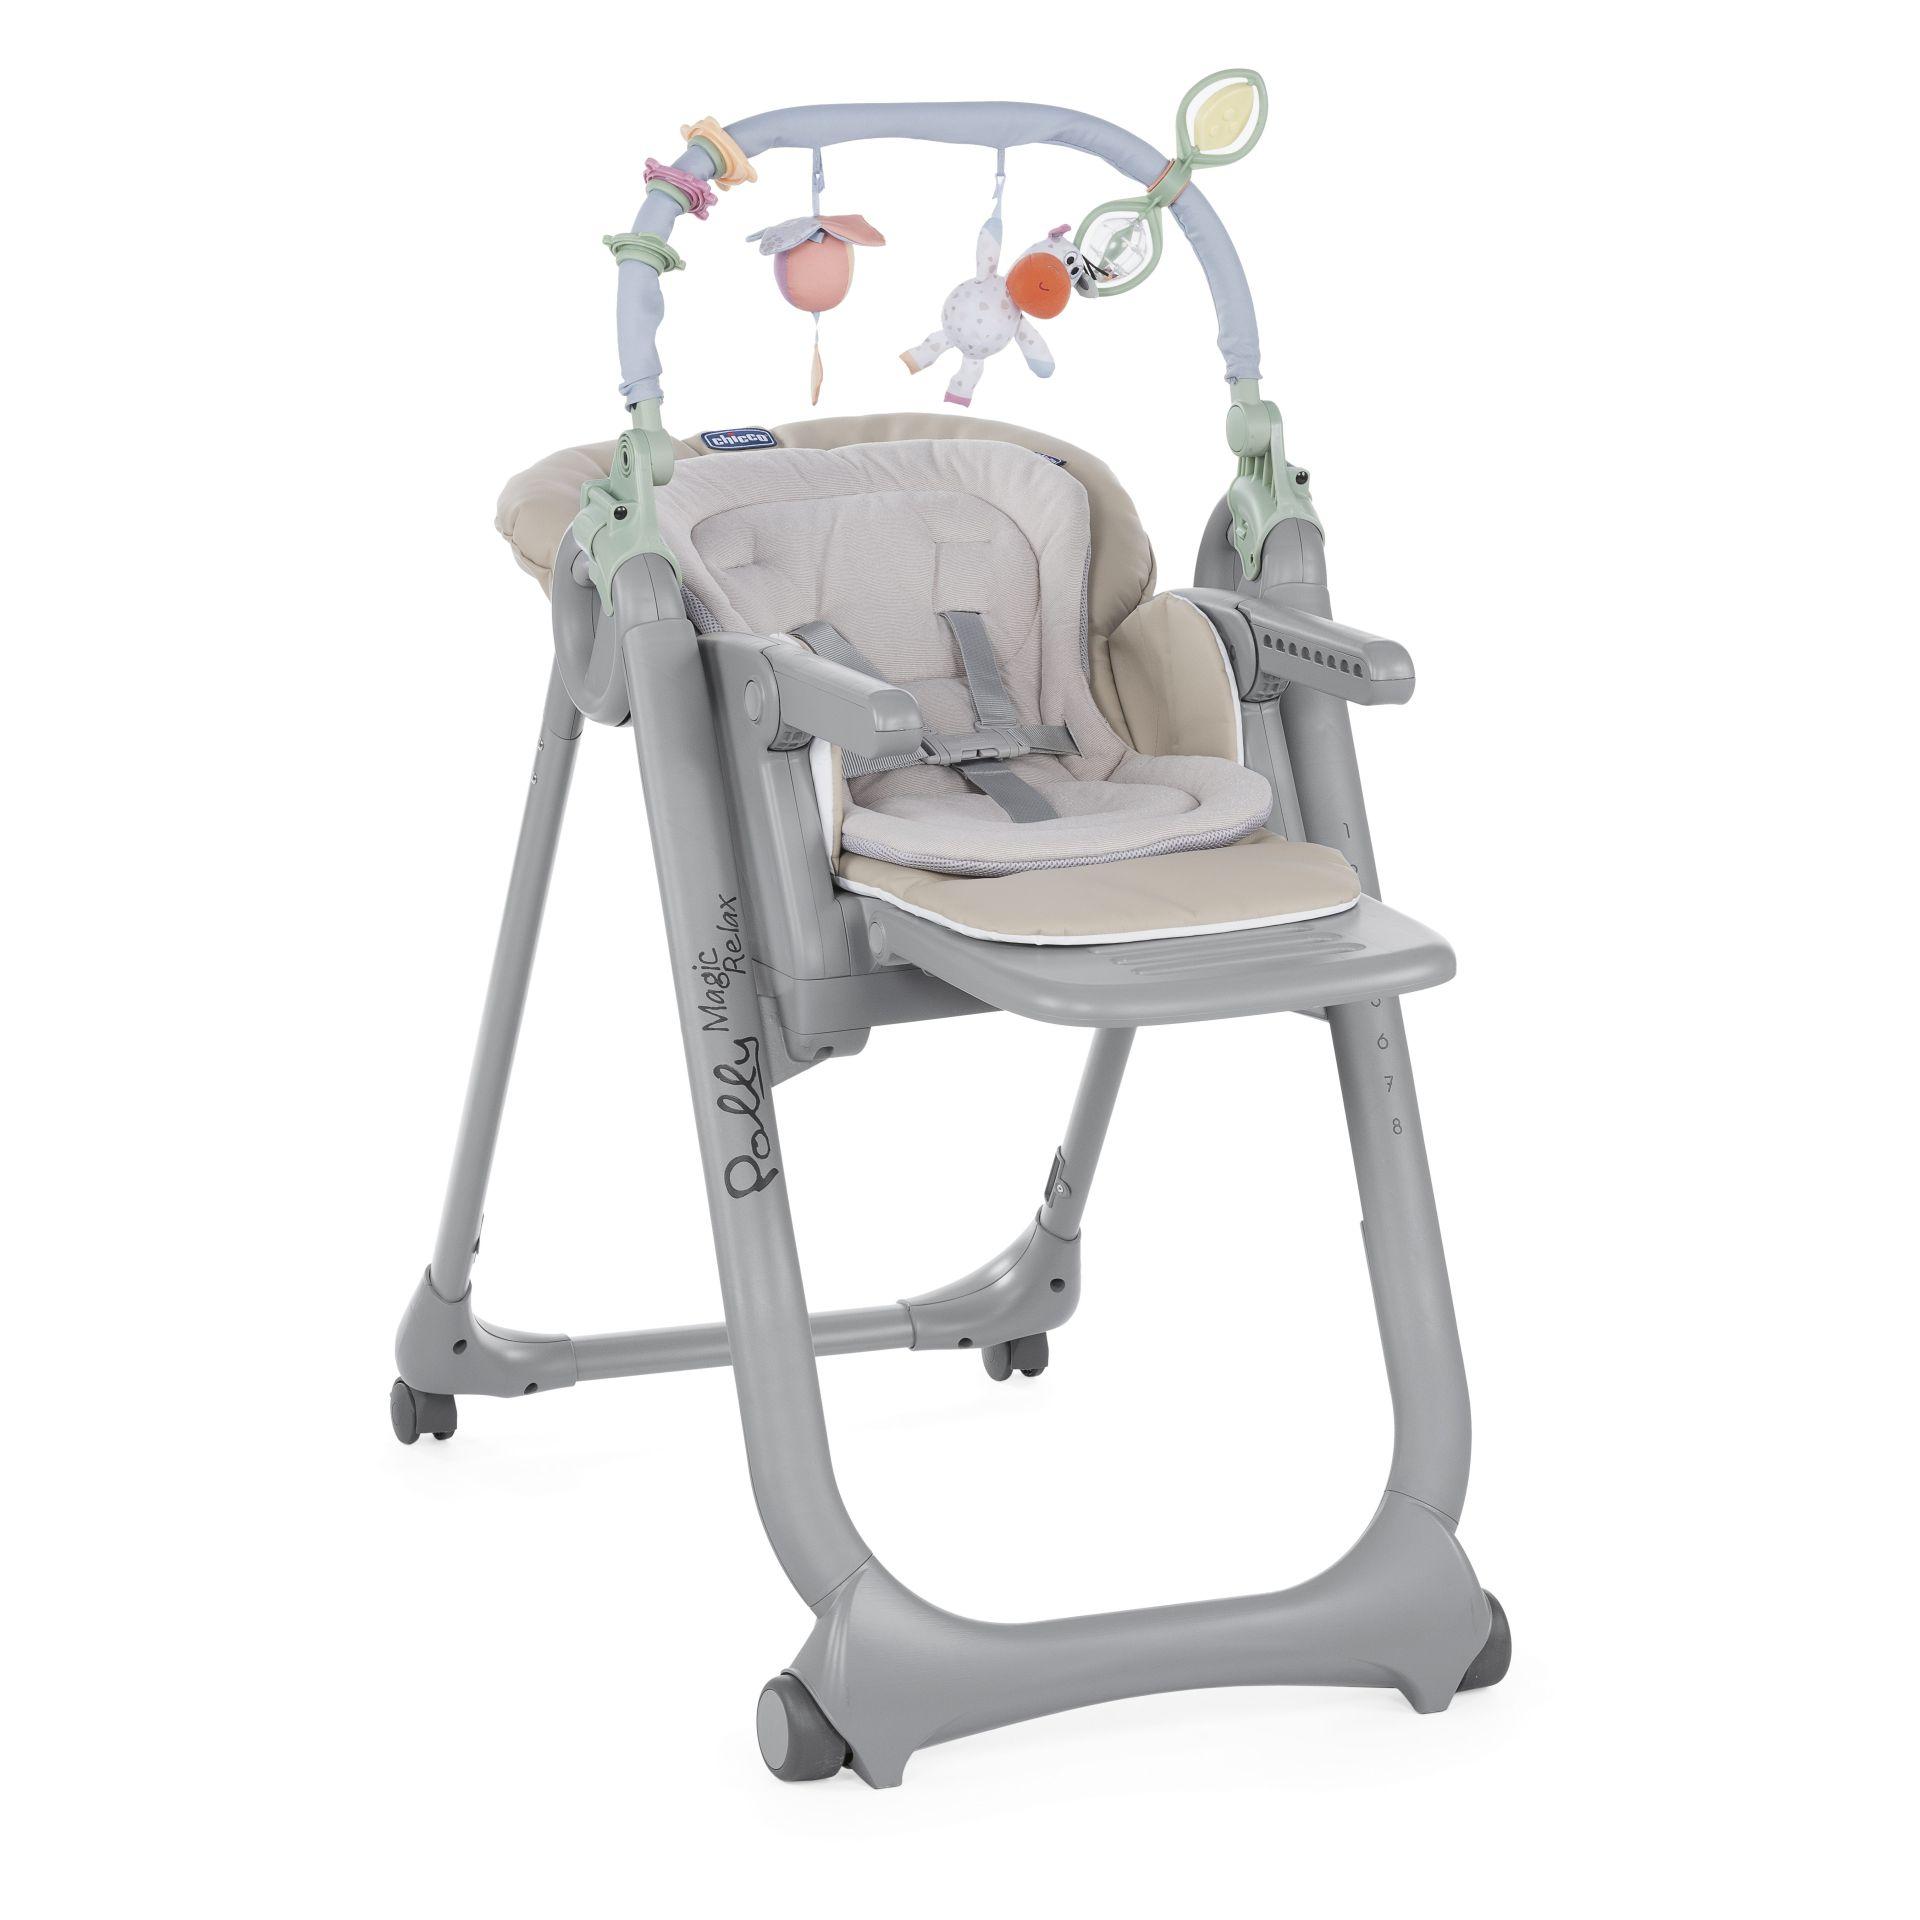 chaise haute chicco polly magic relax 2018 beige acheter sur kidsroom b b s la maison. Black Bedroom Furniture Sets. Home Design Ideas